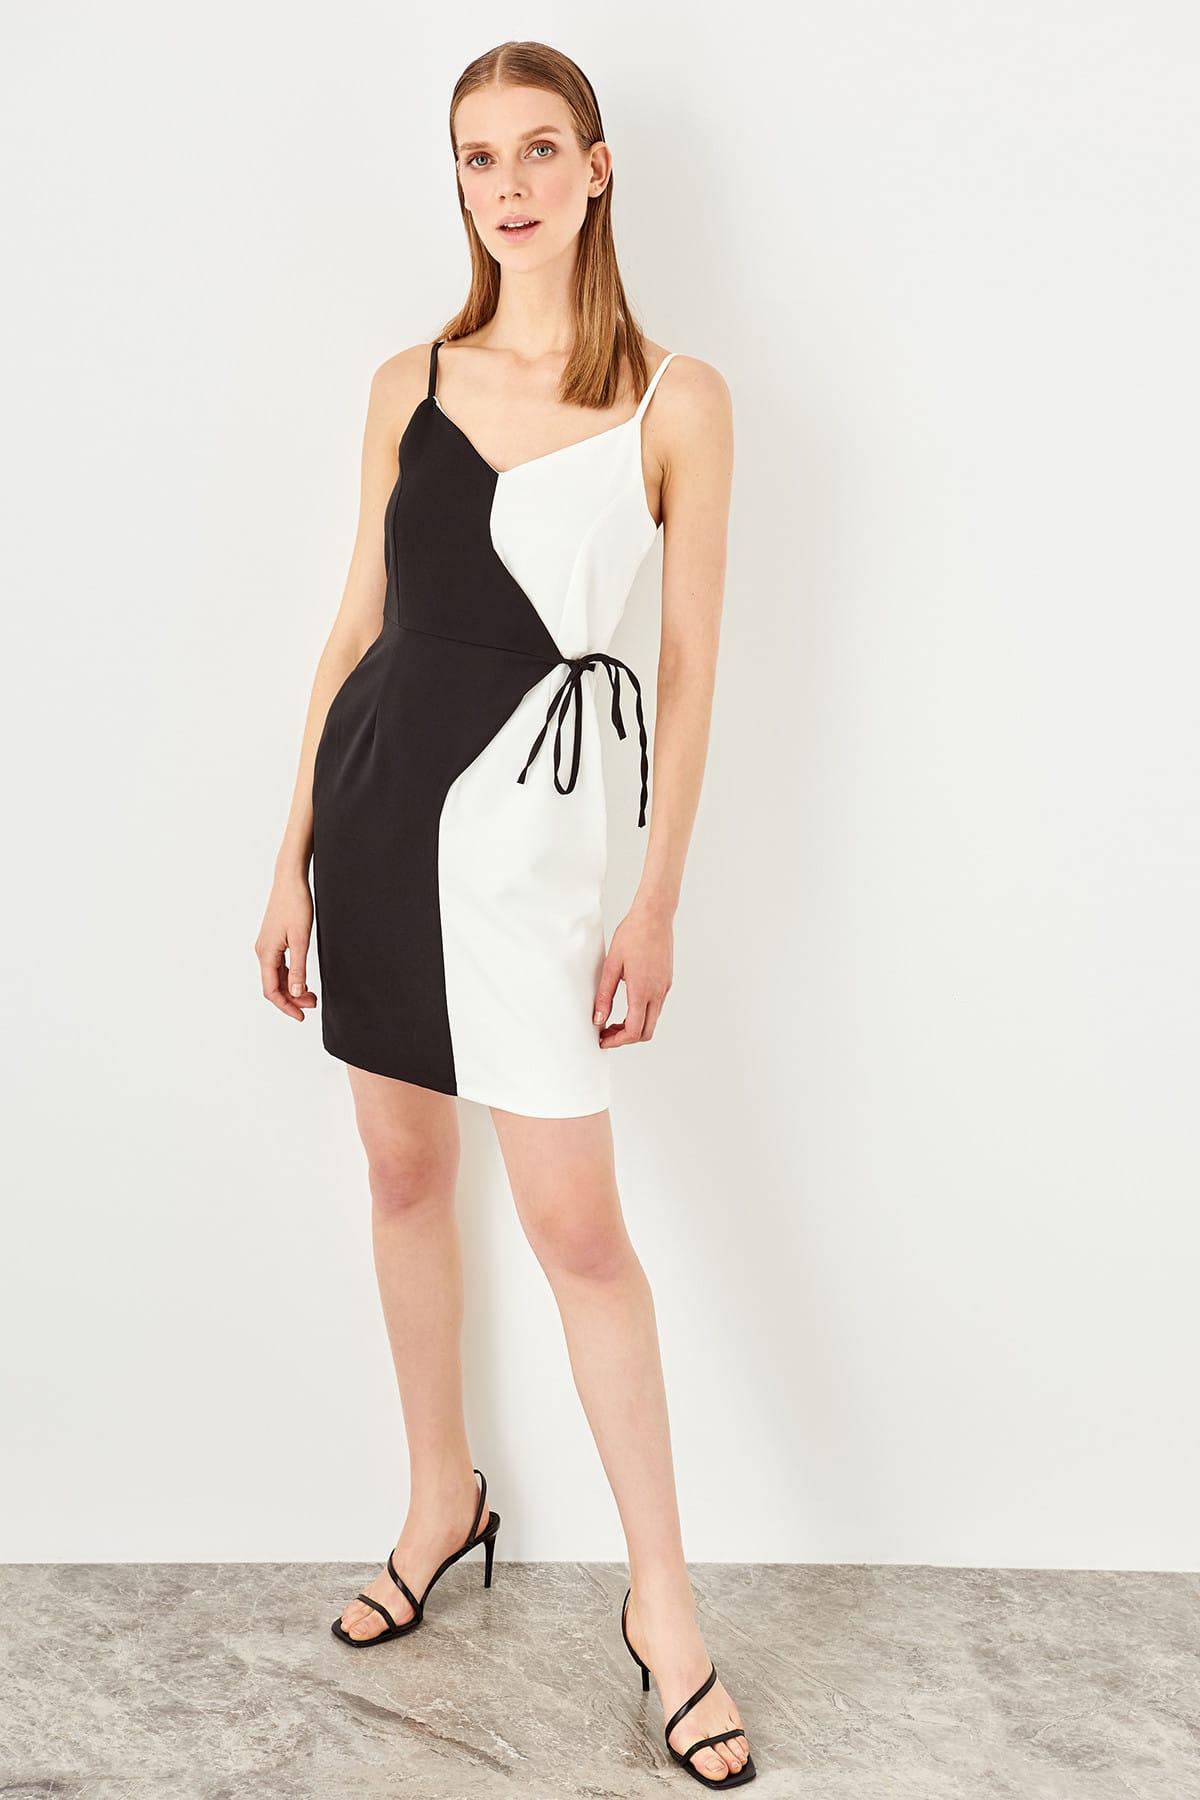 Trendyol Black and white binding detailed dress